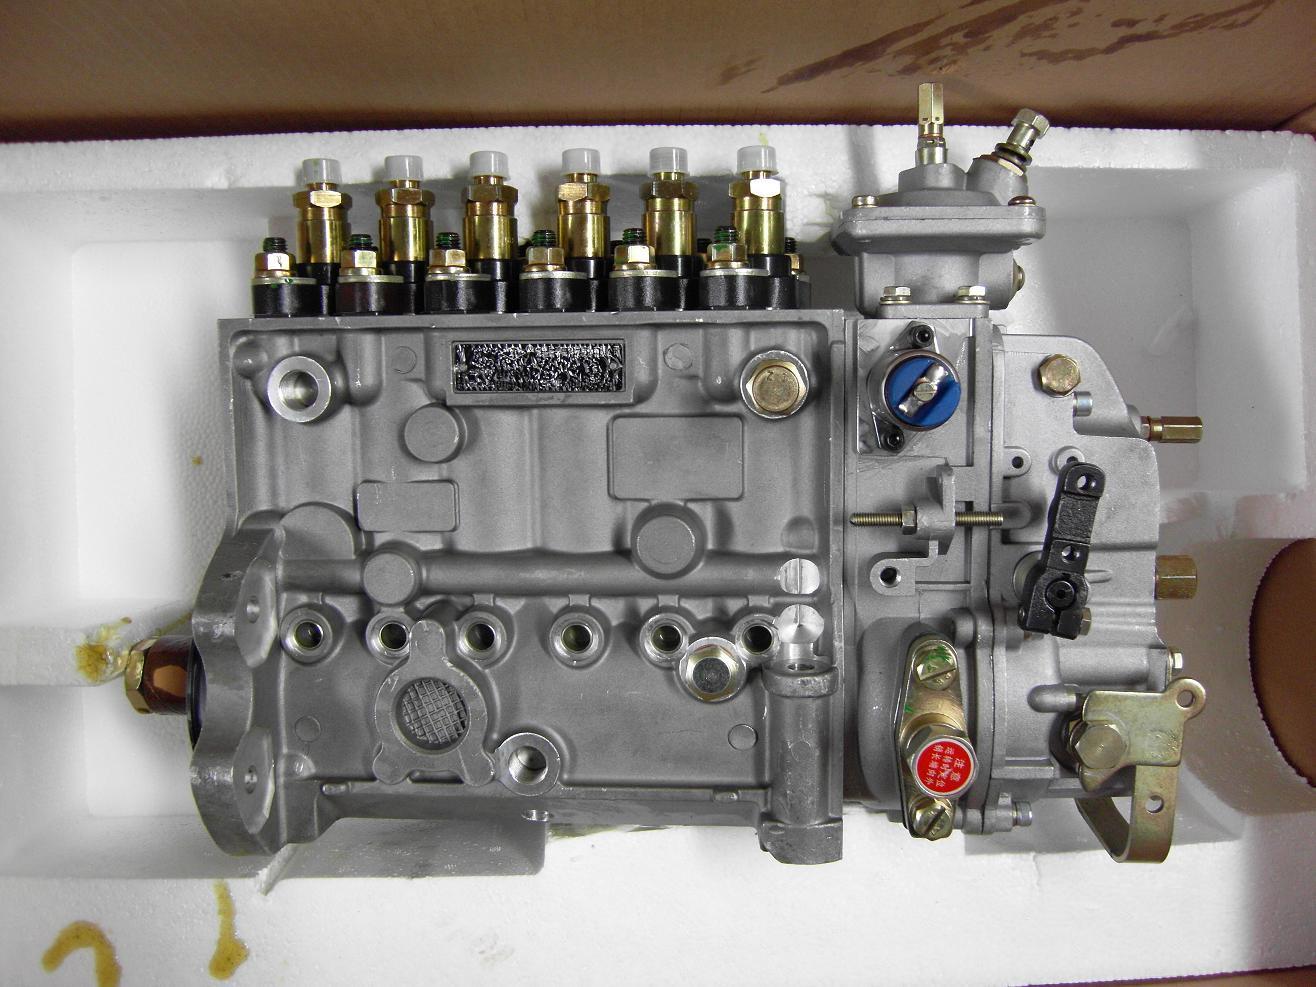 l 39 injection de carburant de cummins pompe les pi ces. Black Bedroom Furniture Sets. Home Design Ideas